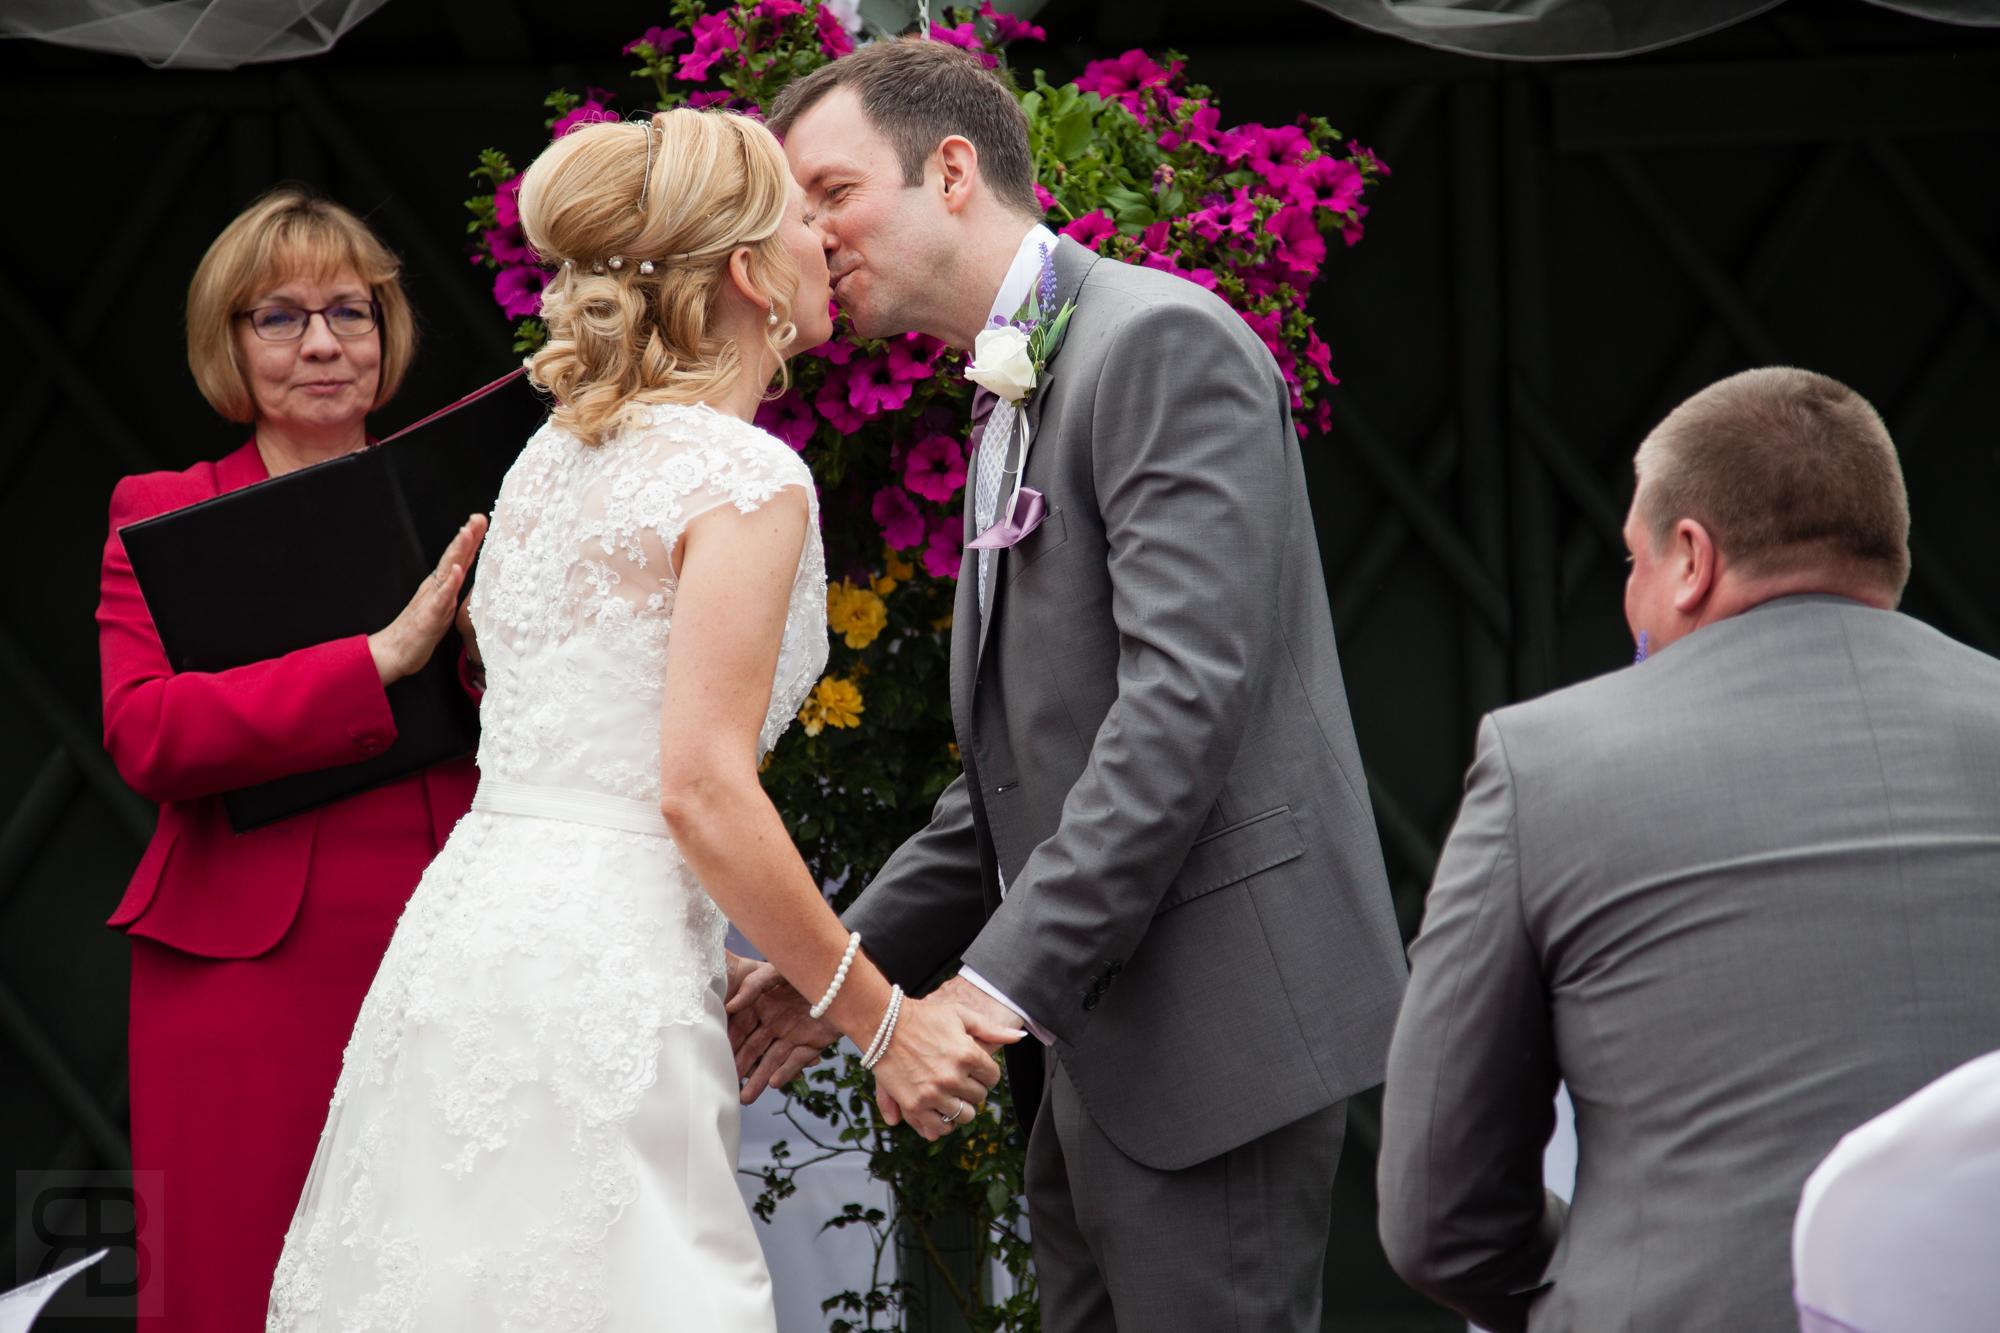 110715_LisaCraigJohnson_Wedding_5680272_WebWM.jpg